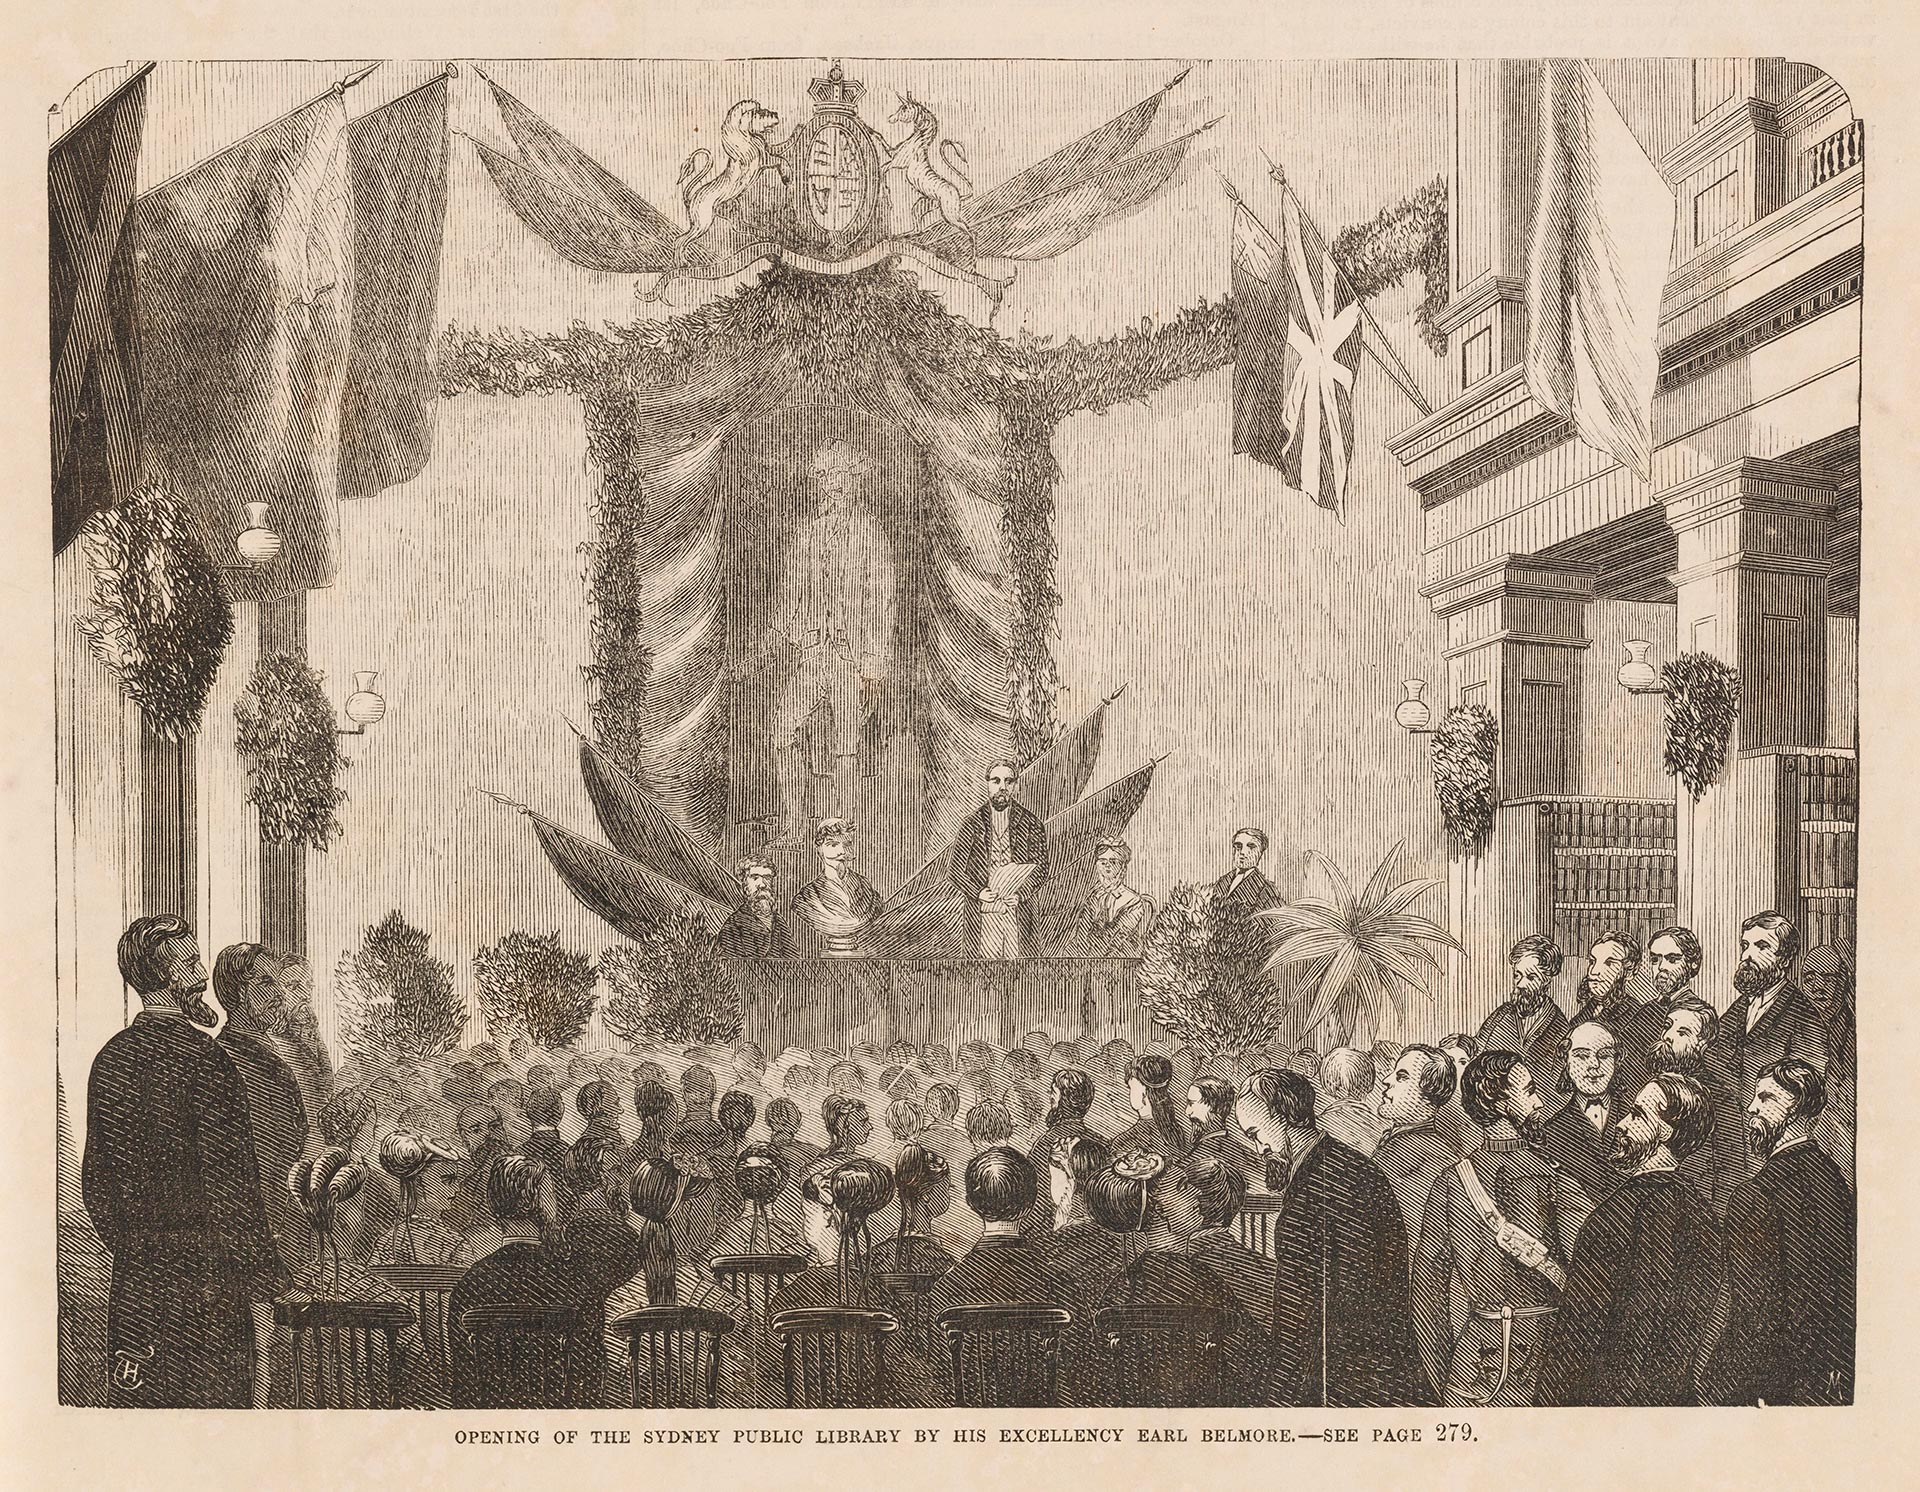 An illustration depicting a lavish gathering of gentlemen.